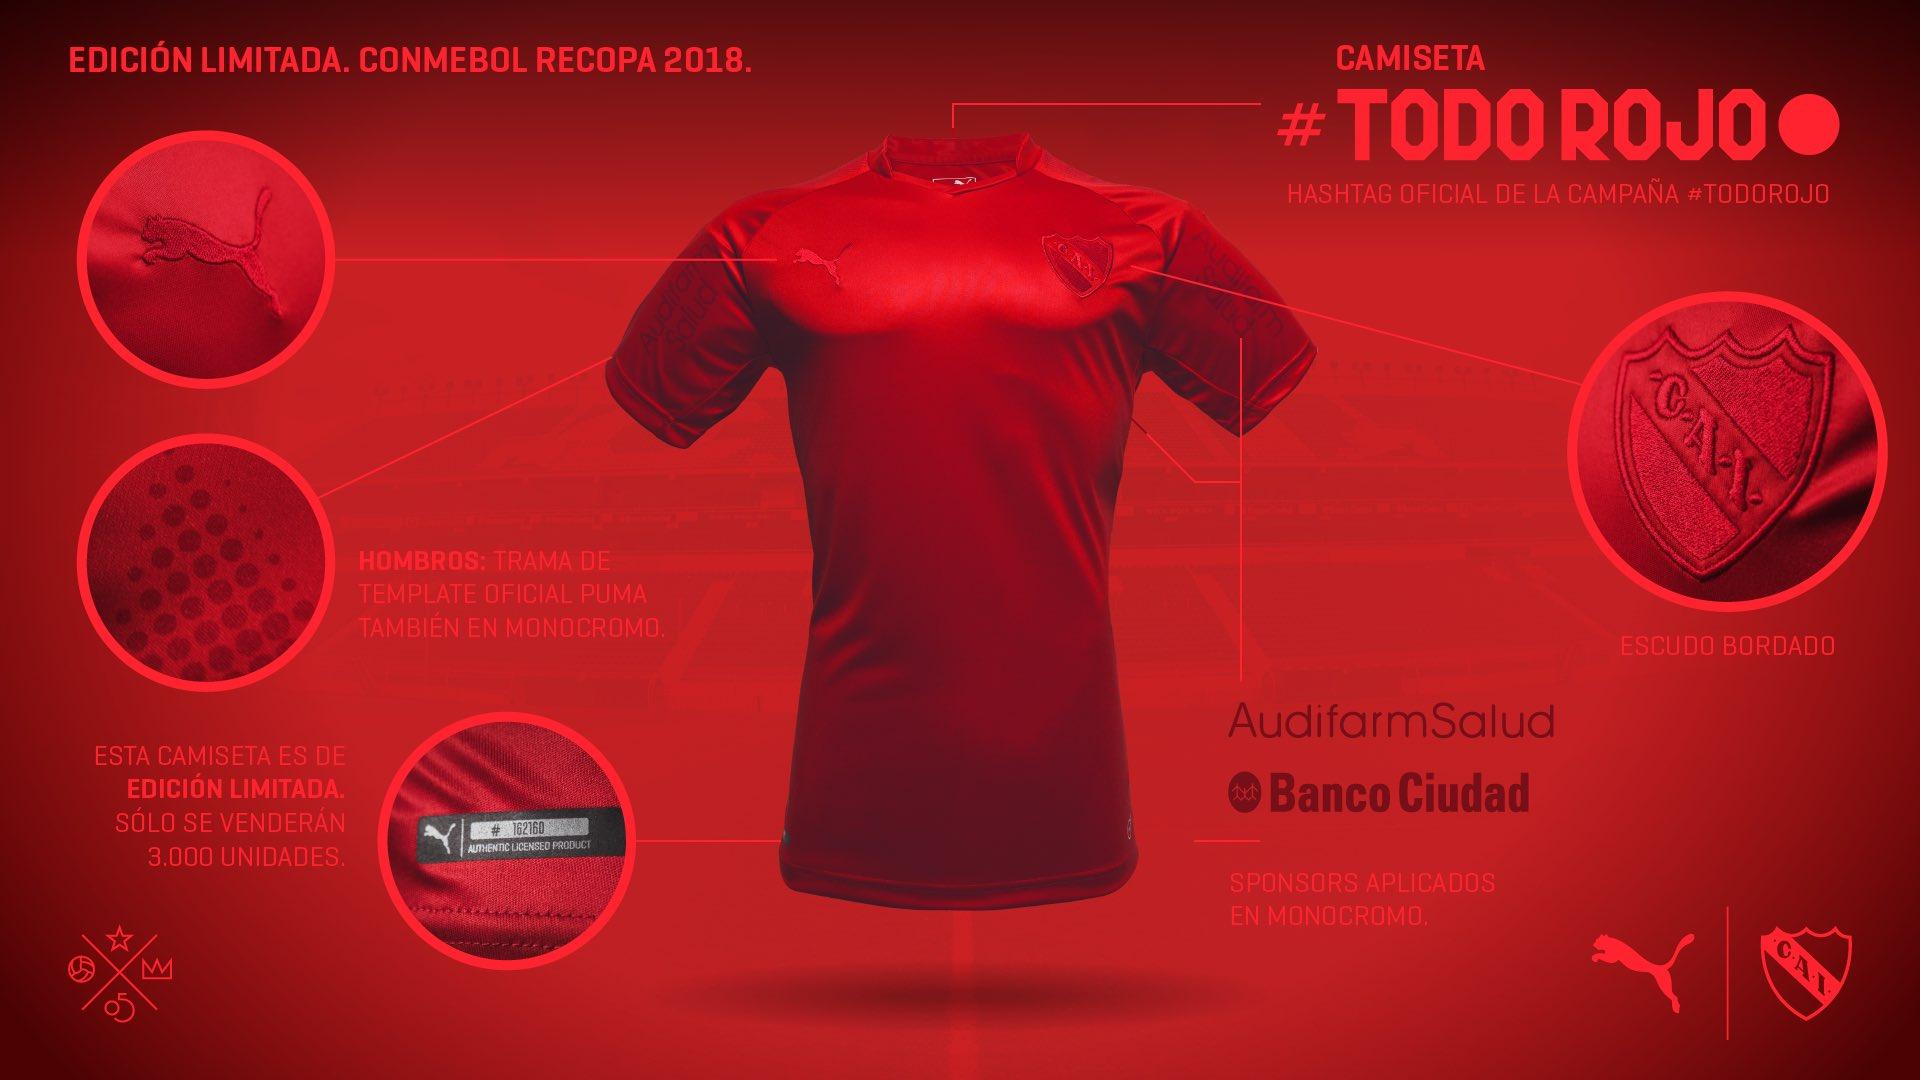 a191b9fca8c Club Atlético Independiente 2018 Recopa Sudamericana All Red PUMA Football  Kit, Soccer Jersey, Shirt